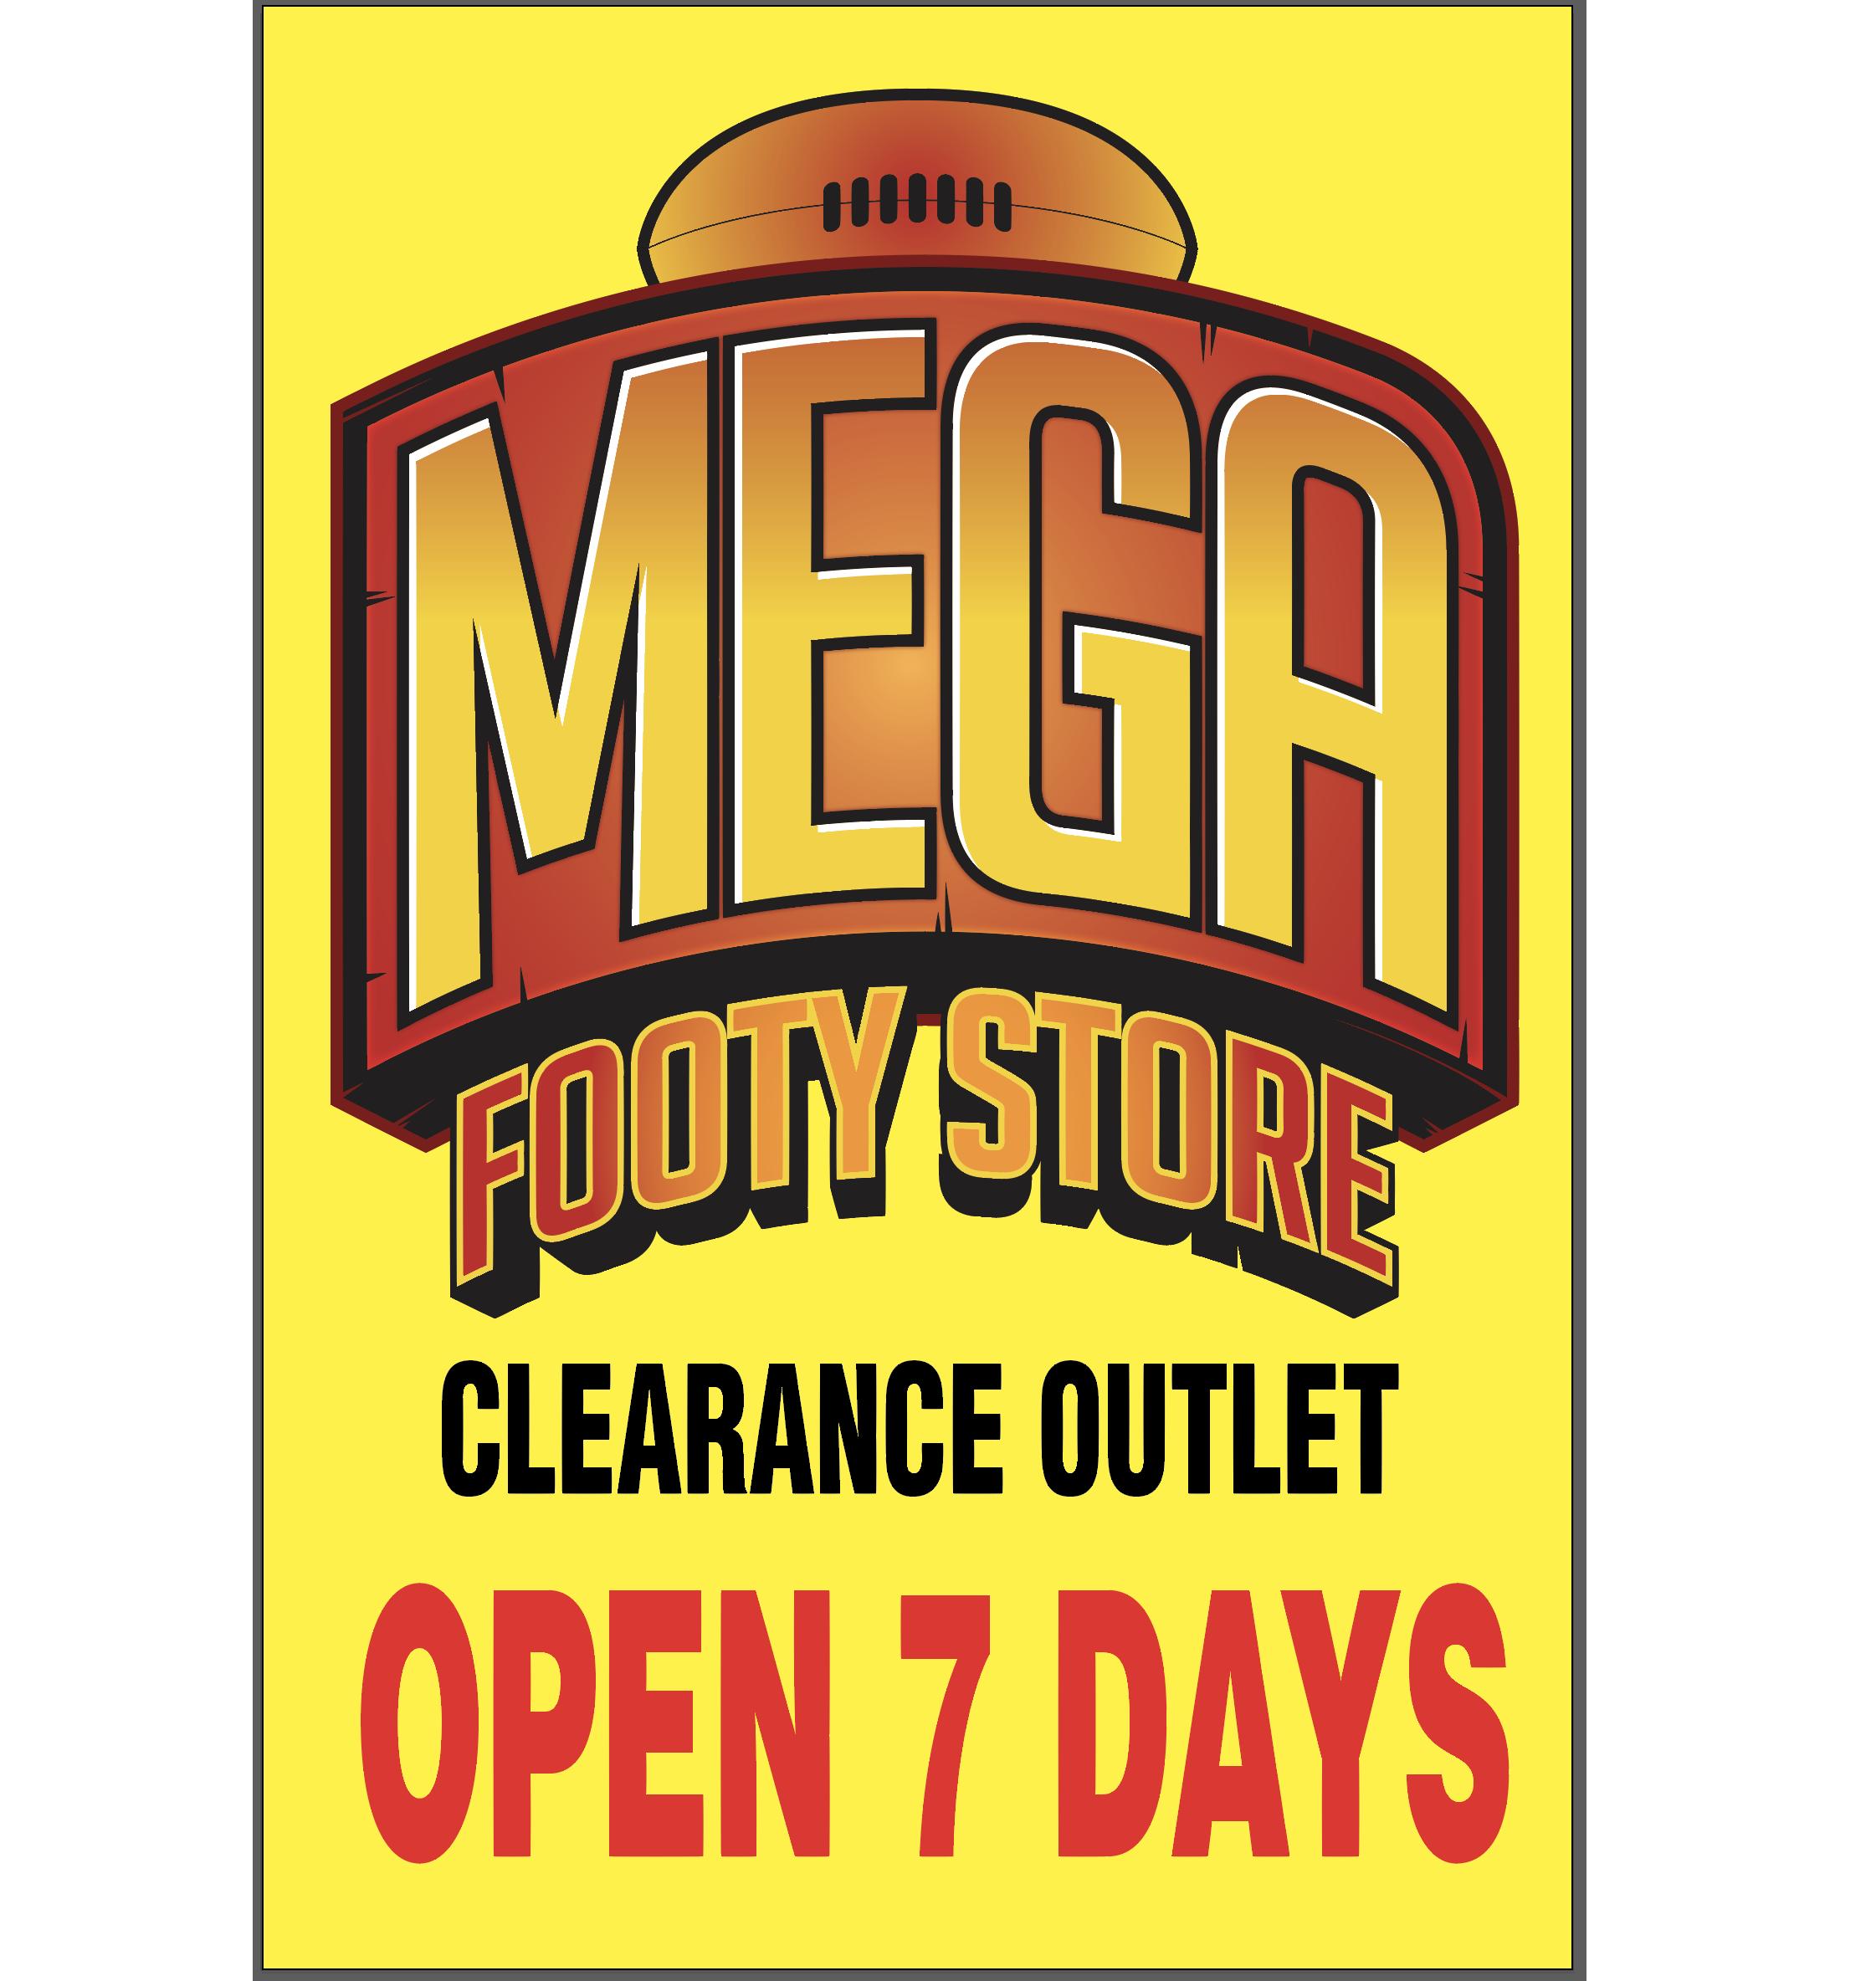 Mega Footy Store